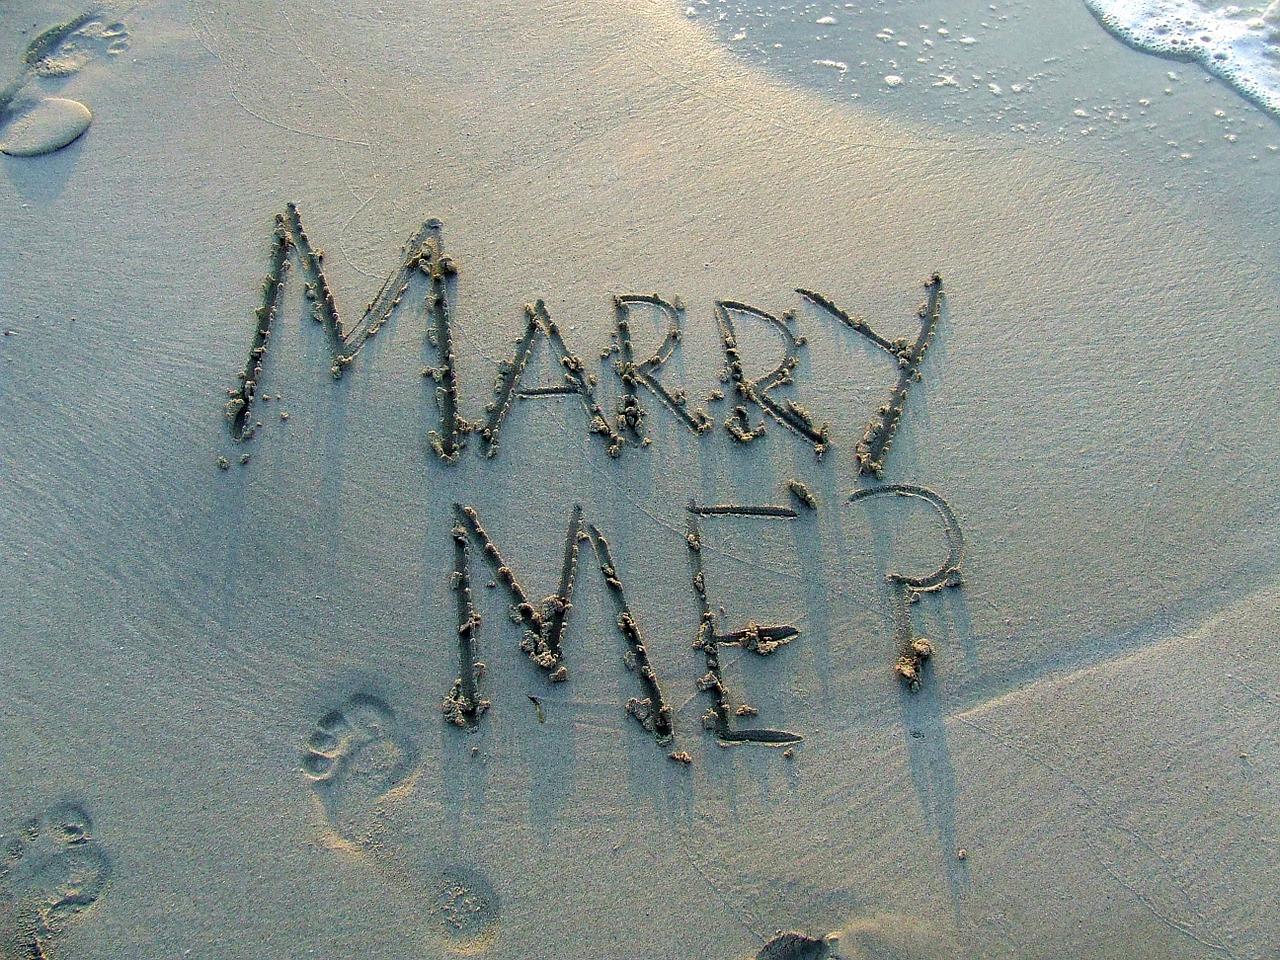 must-watch-video-wedding-proposals-get-mushy